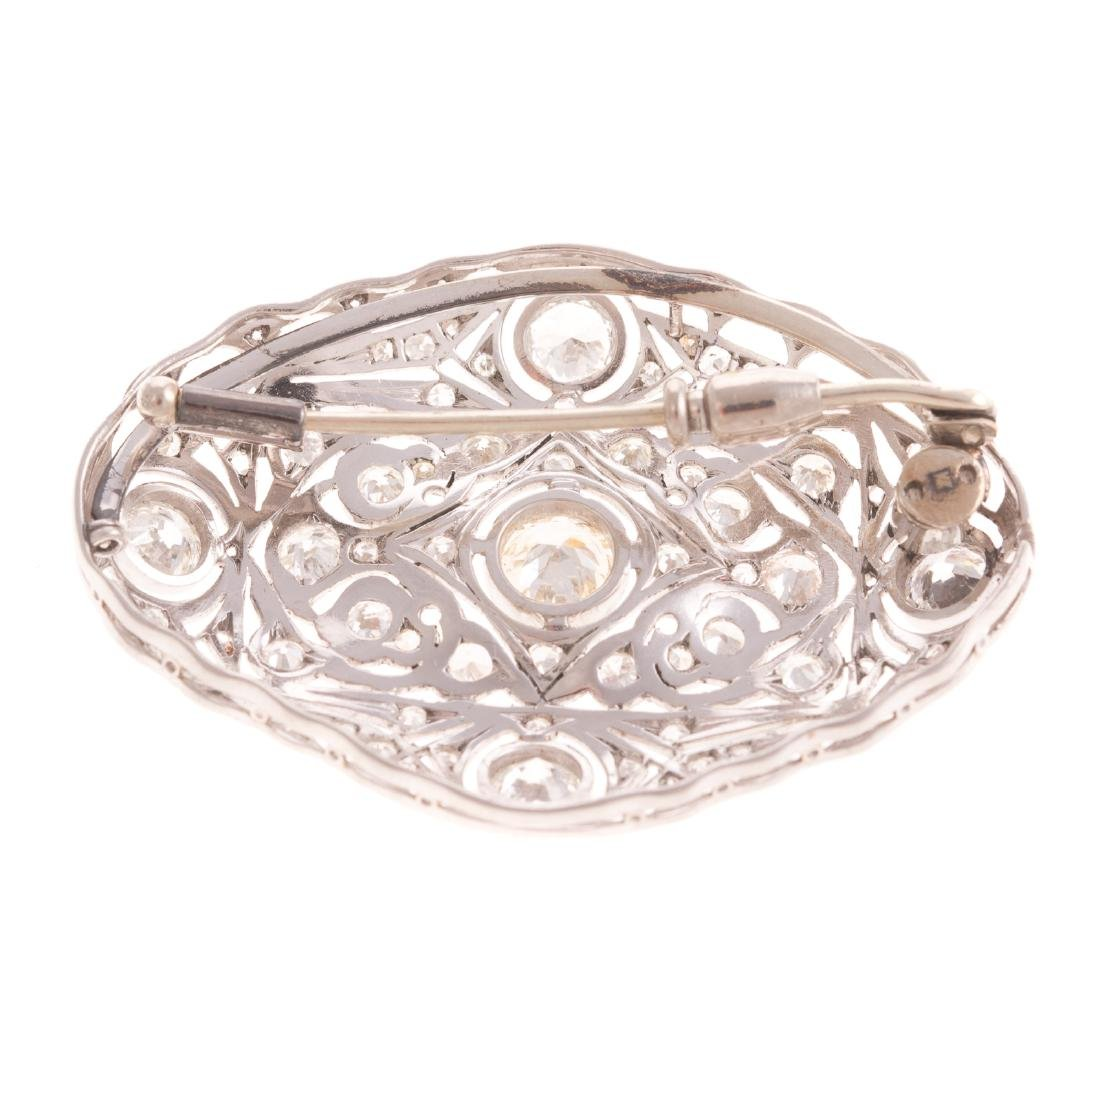 An Art Deco Diamond Filigree Brooch in Platinum - 3